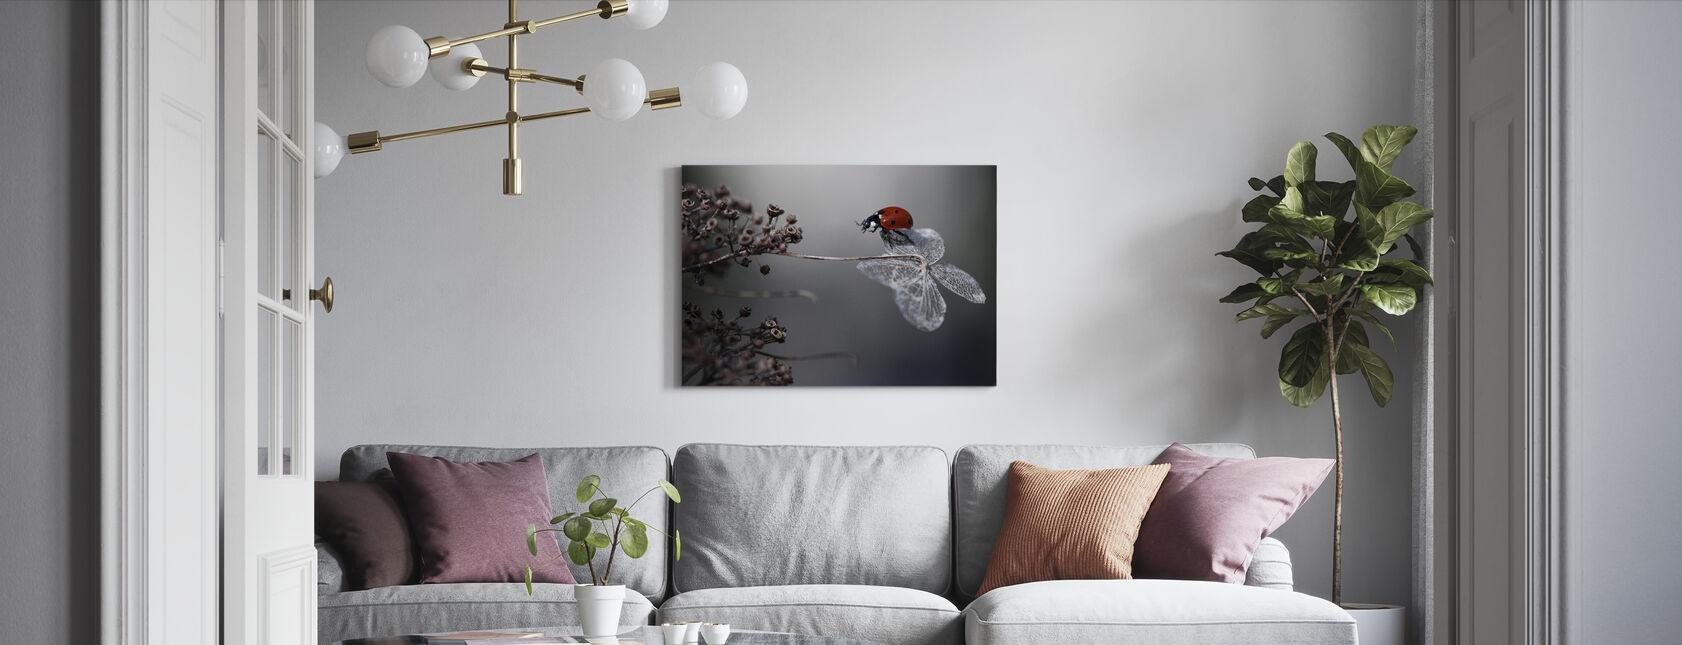 Lieveheersbeestje op Hortensia - Canvas print - Woonkamer